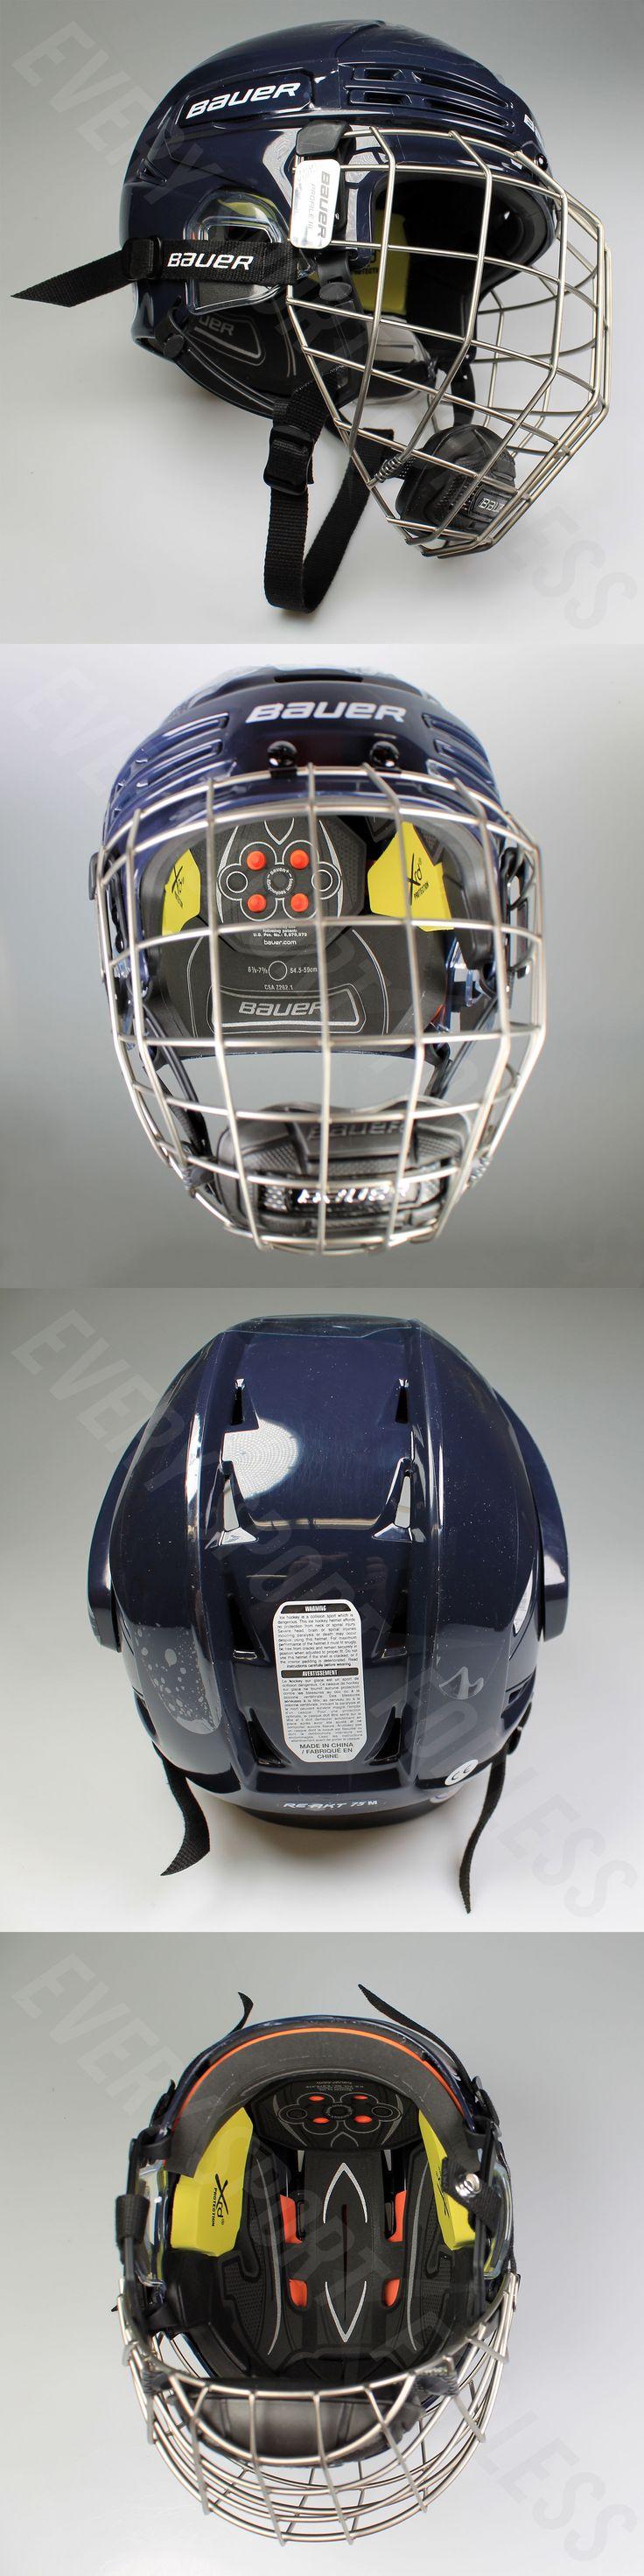 Helmets 20854: Bauer Re-Akt 75 Combo Senior Hockey Helmet W Cage - Navy Blue (New) -> BUY IT NOW ONLY: $159.99 on eBay!